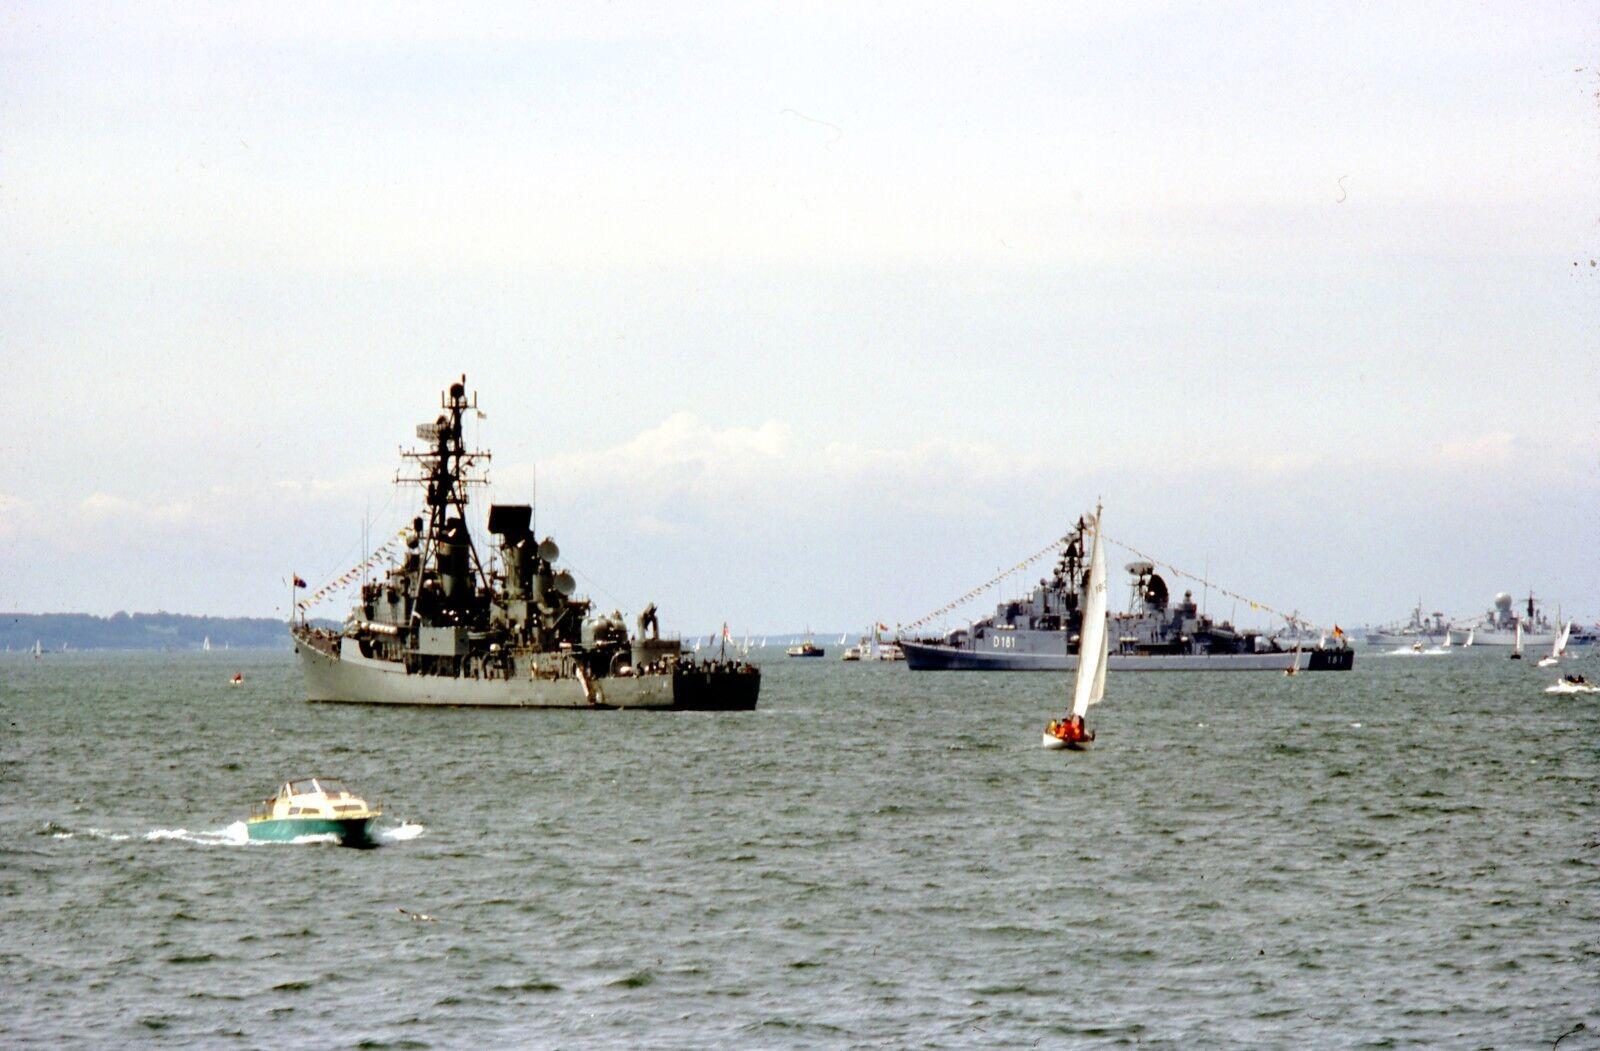 1977 ROYAL NAVY FLEET REVIEW HMAS BRISBANE  Photo Print